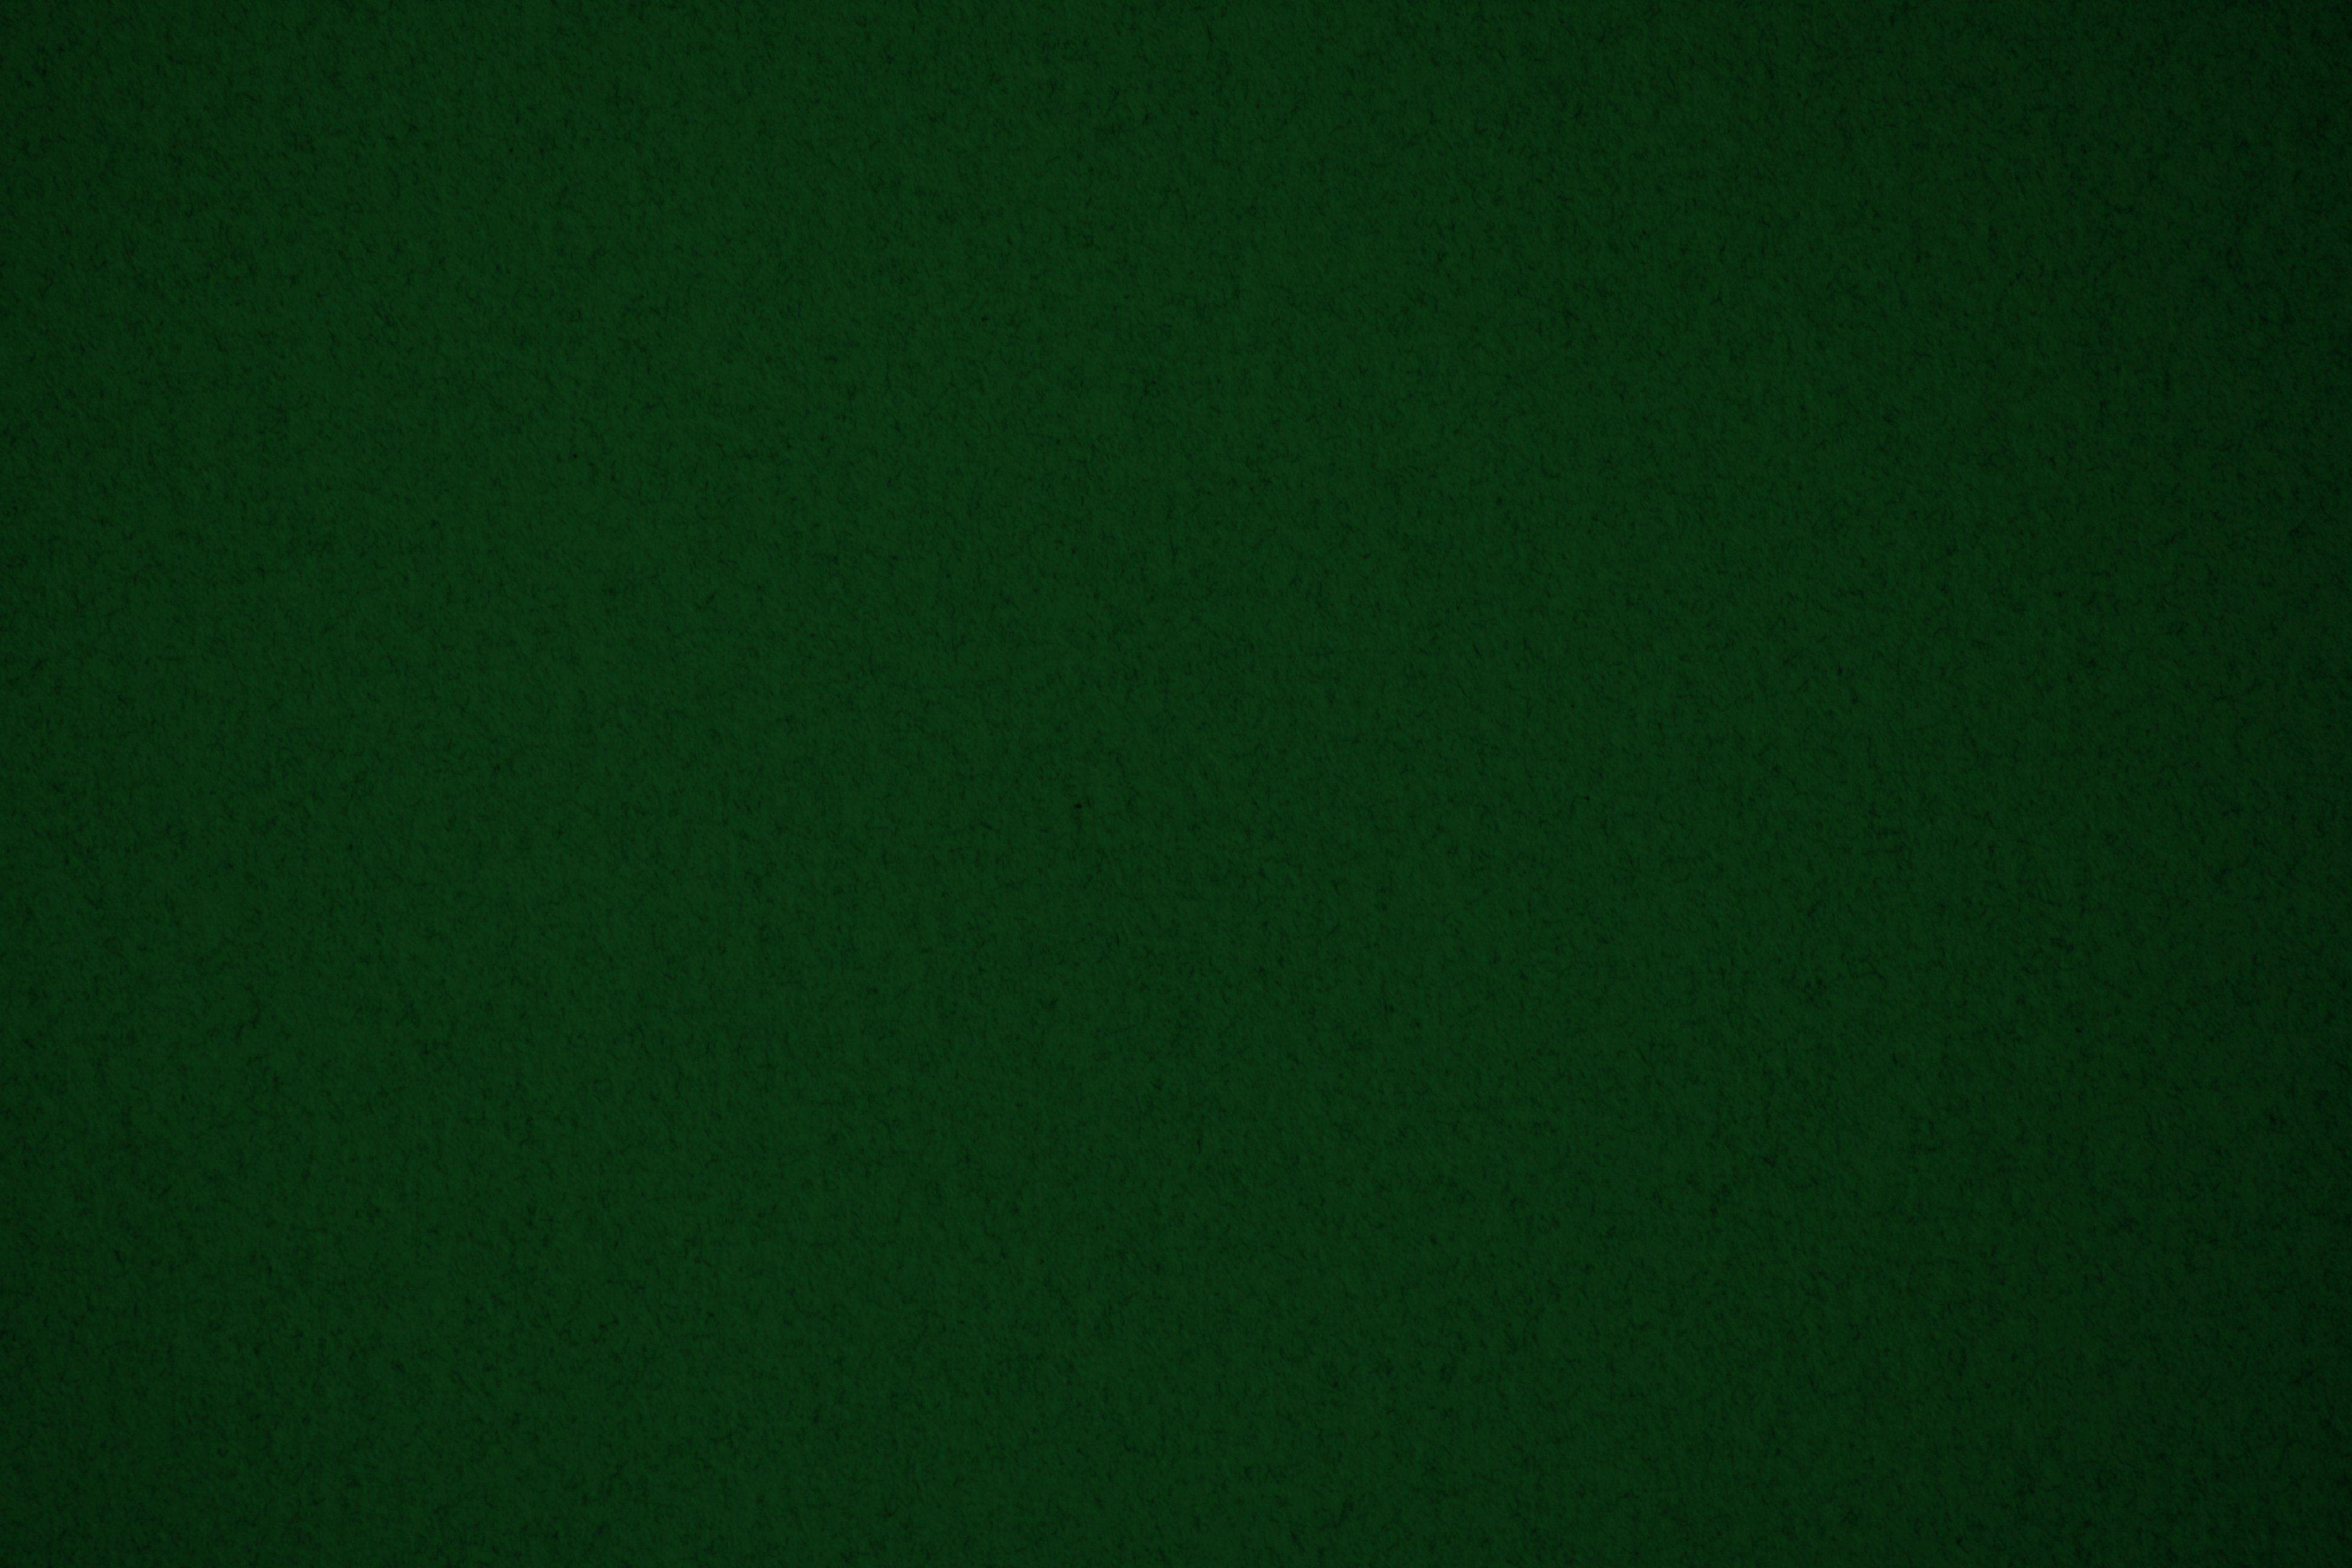 Dark green paper